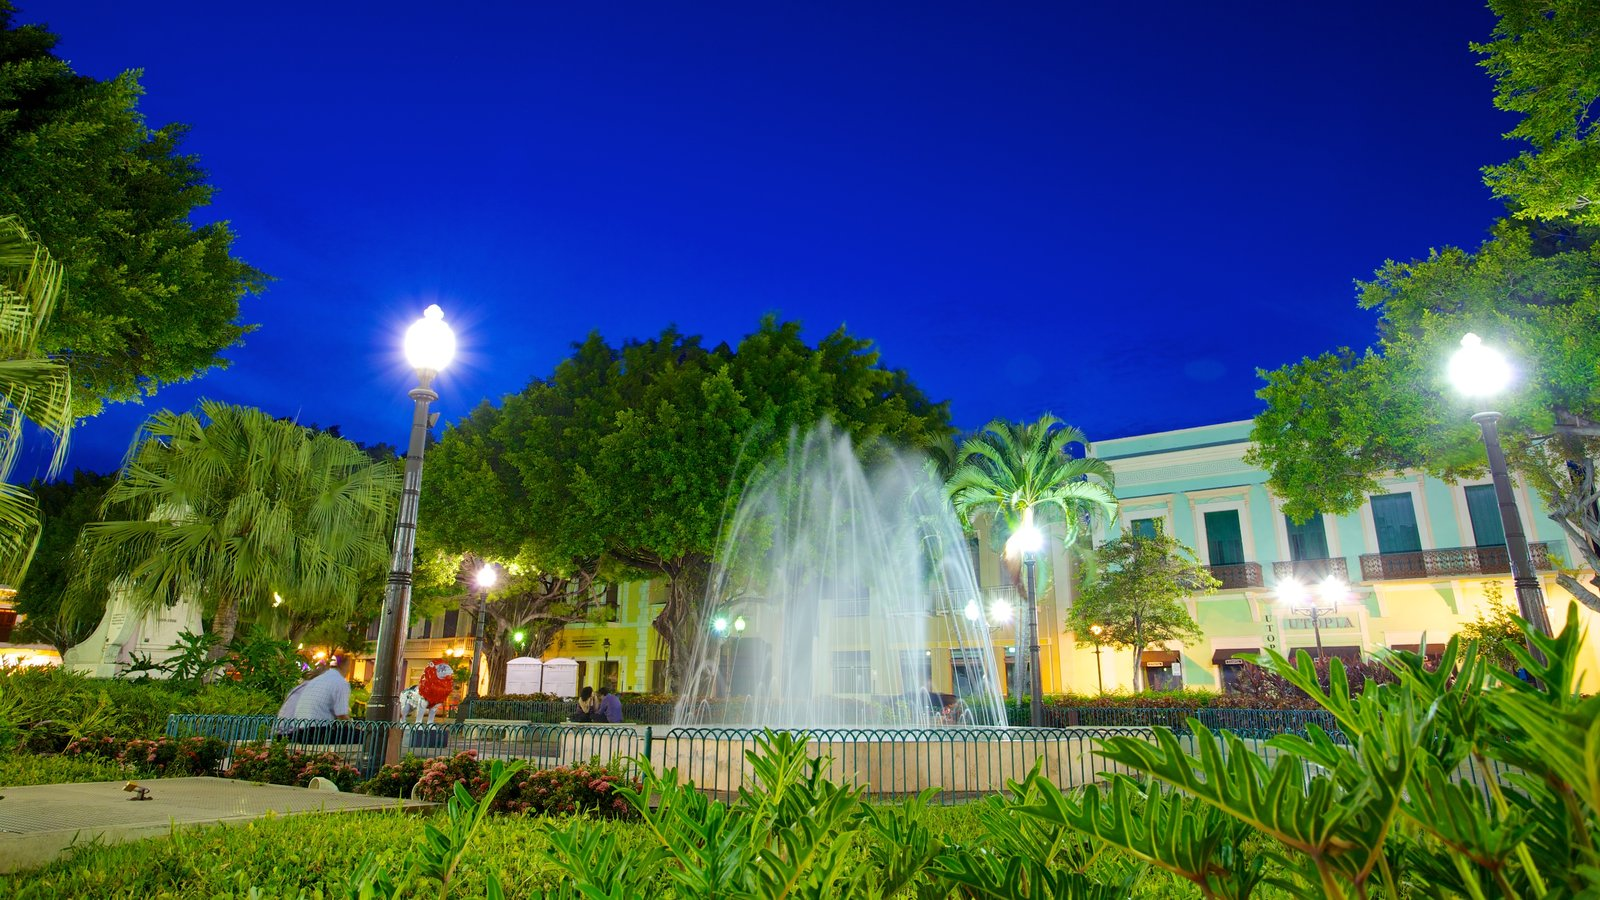 Parque de Bombas which includes night scenes, a fountain and a garden